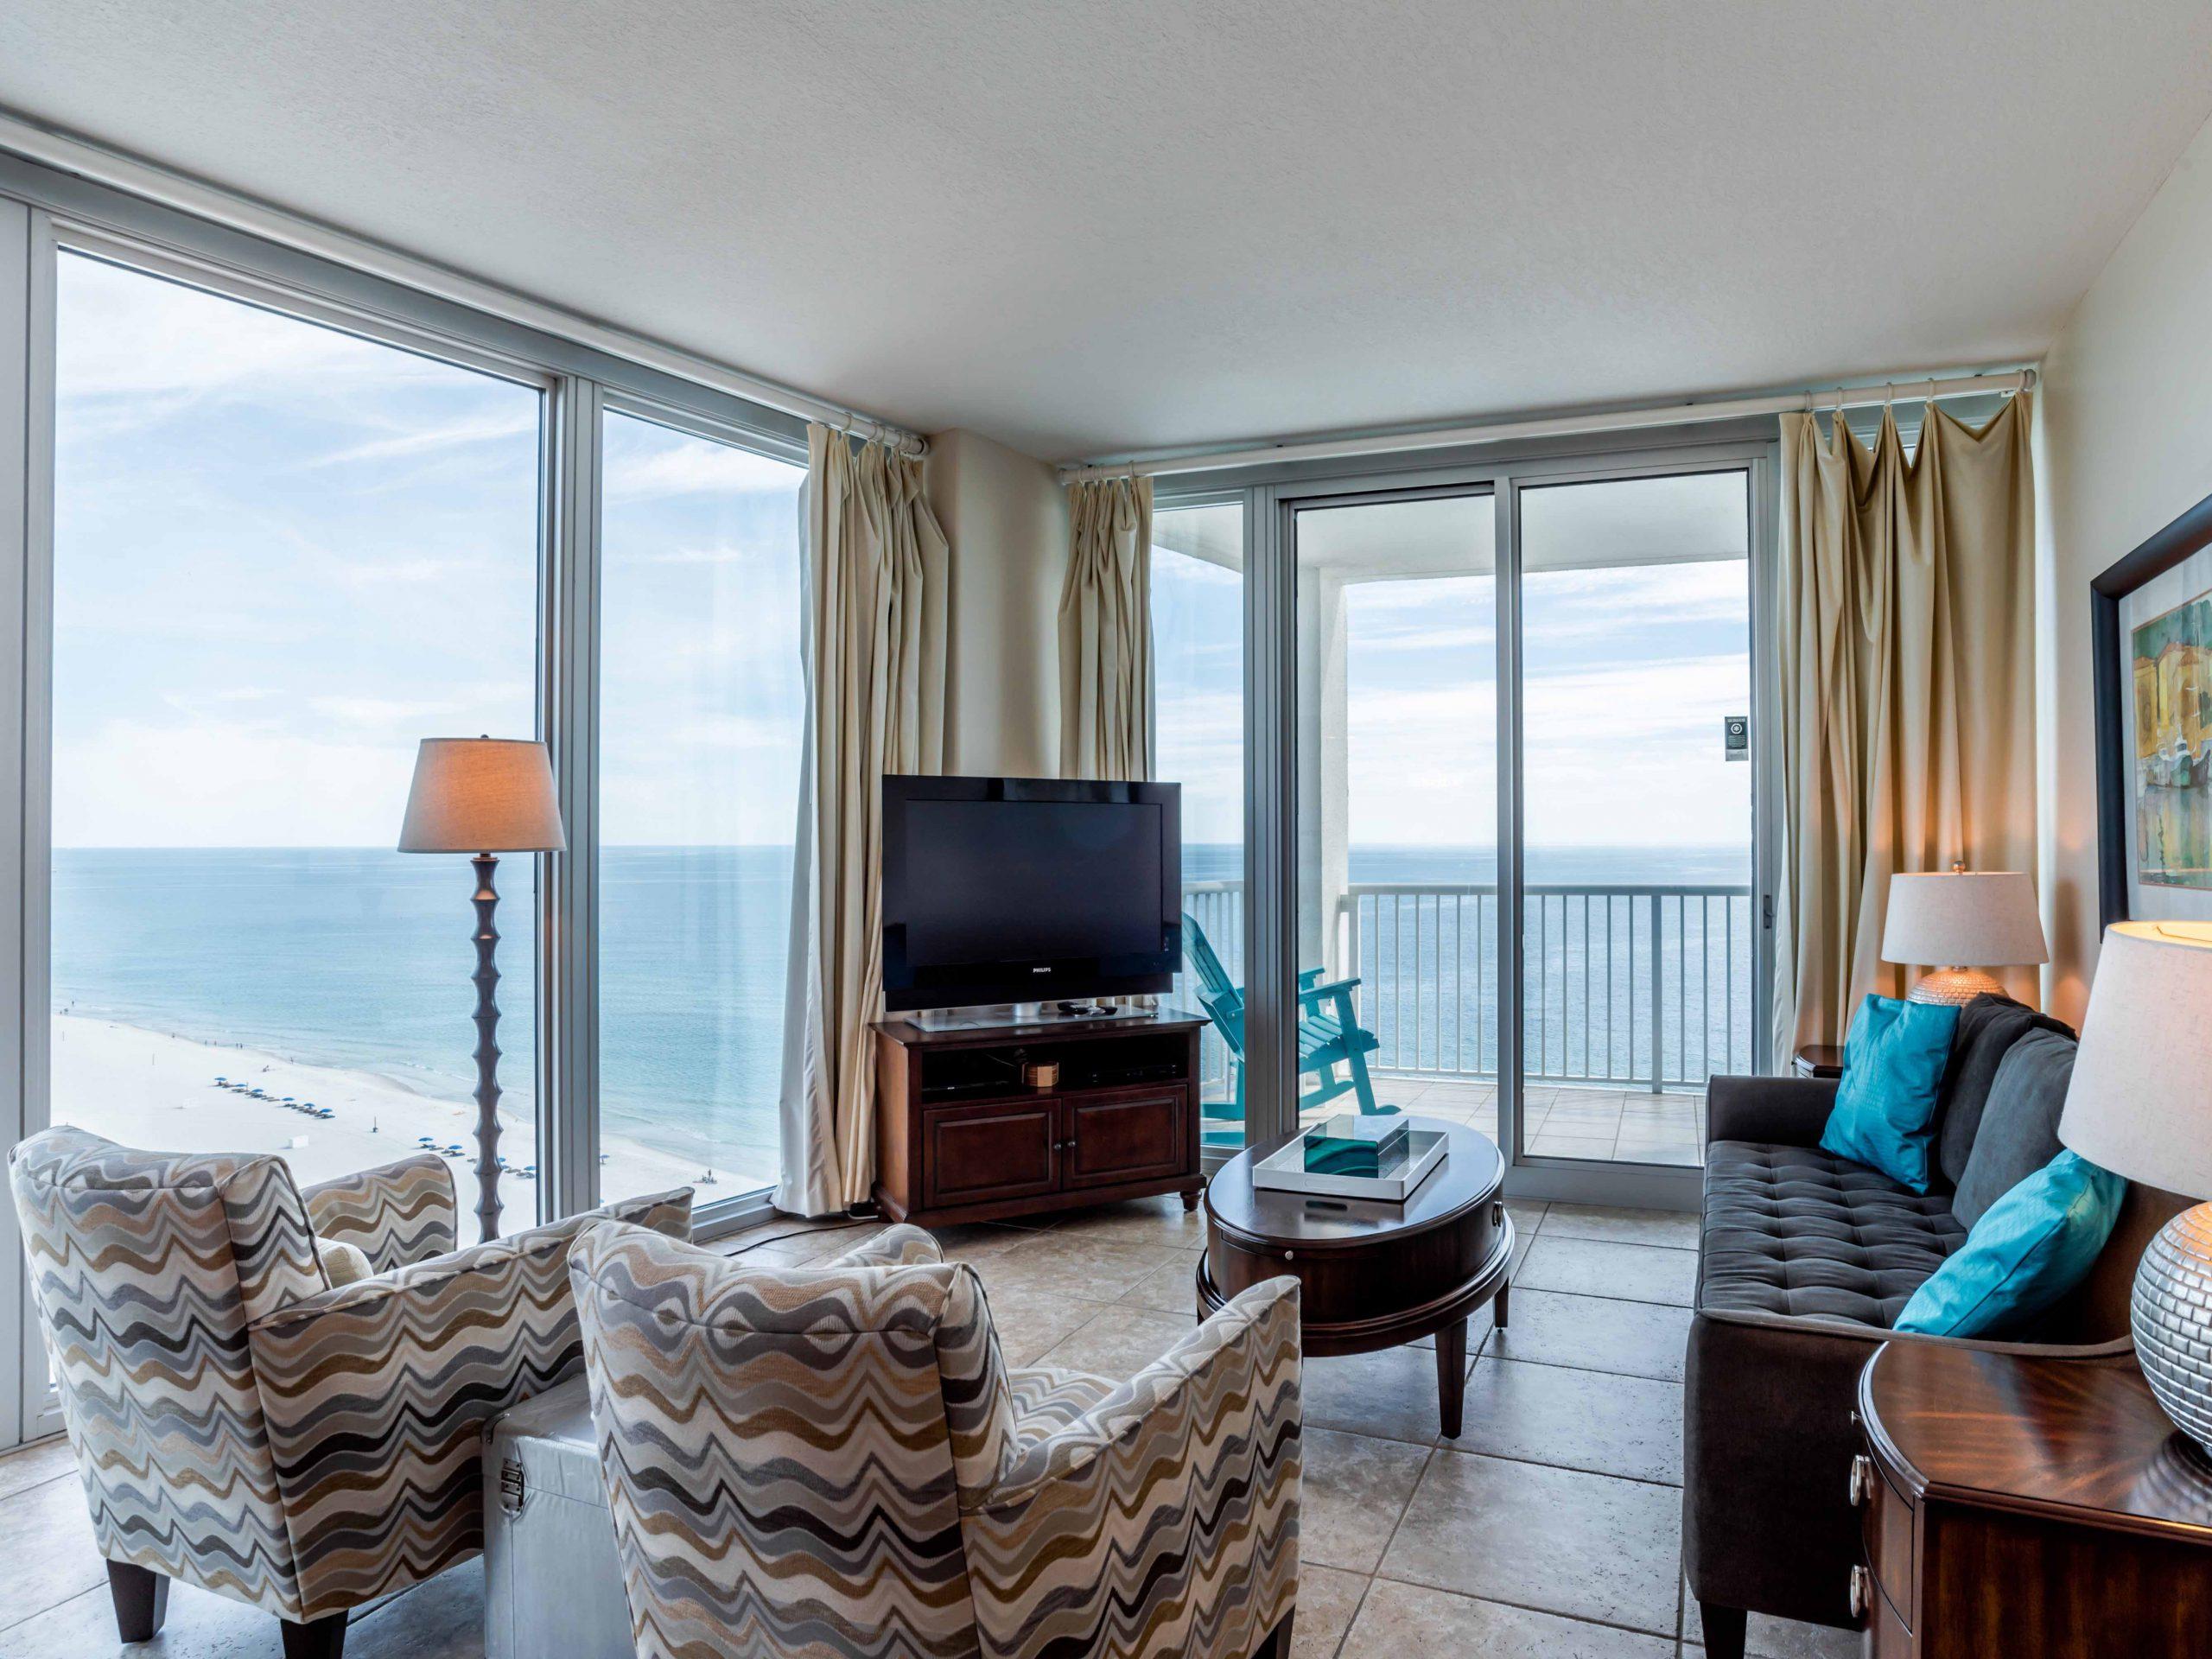 Gulf Shores, Alabama Vacation Rental